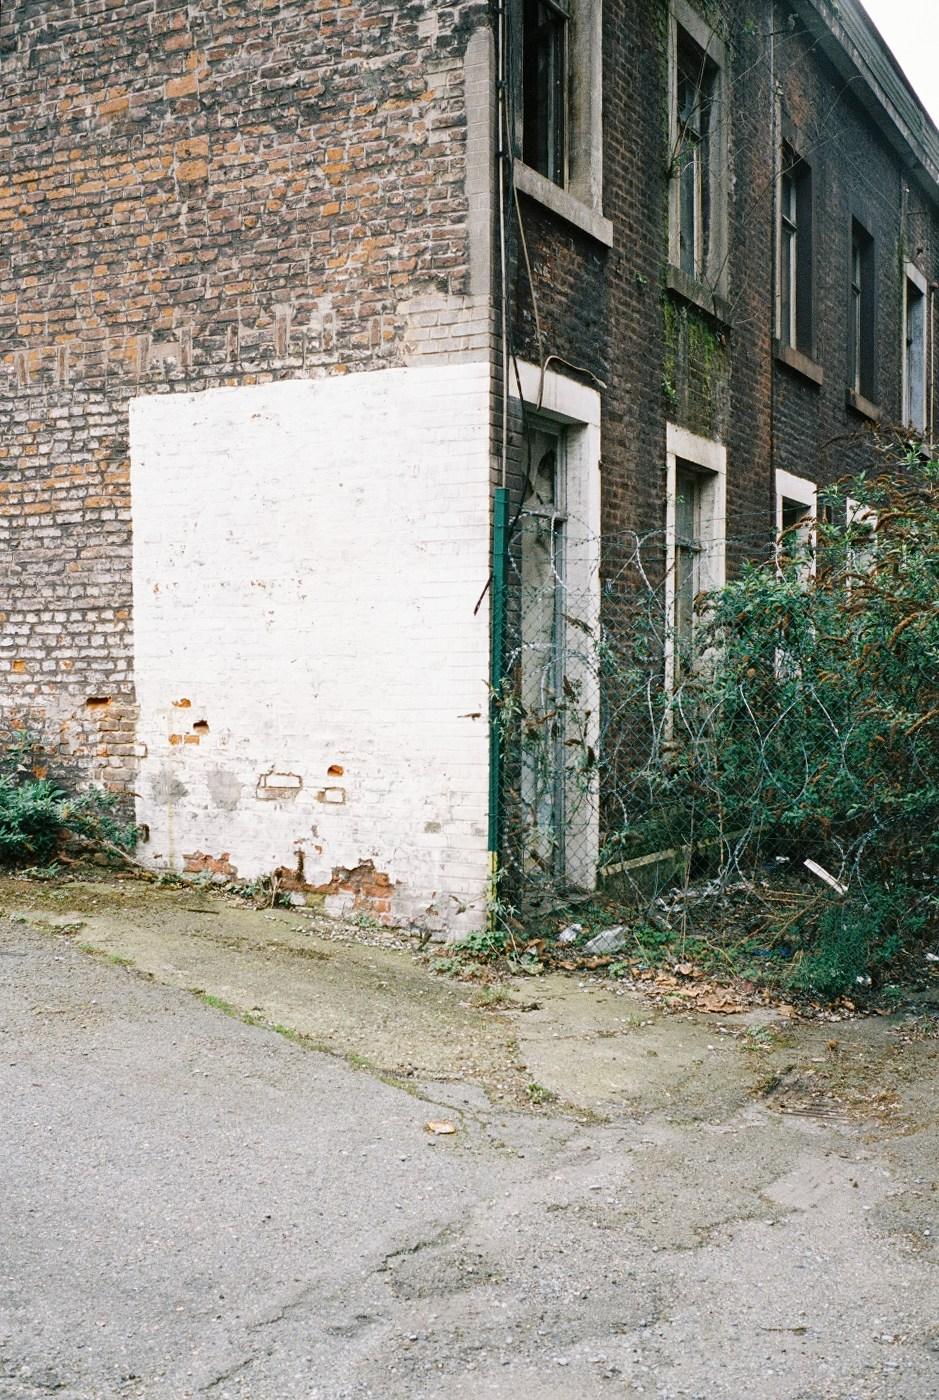 000036JoergBergs-KodakPortra400-MeinFilmLab-M7-35